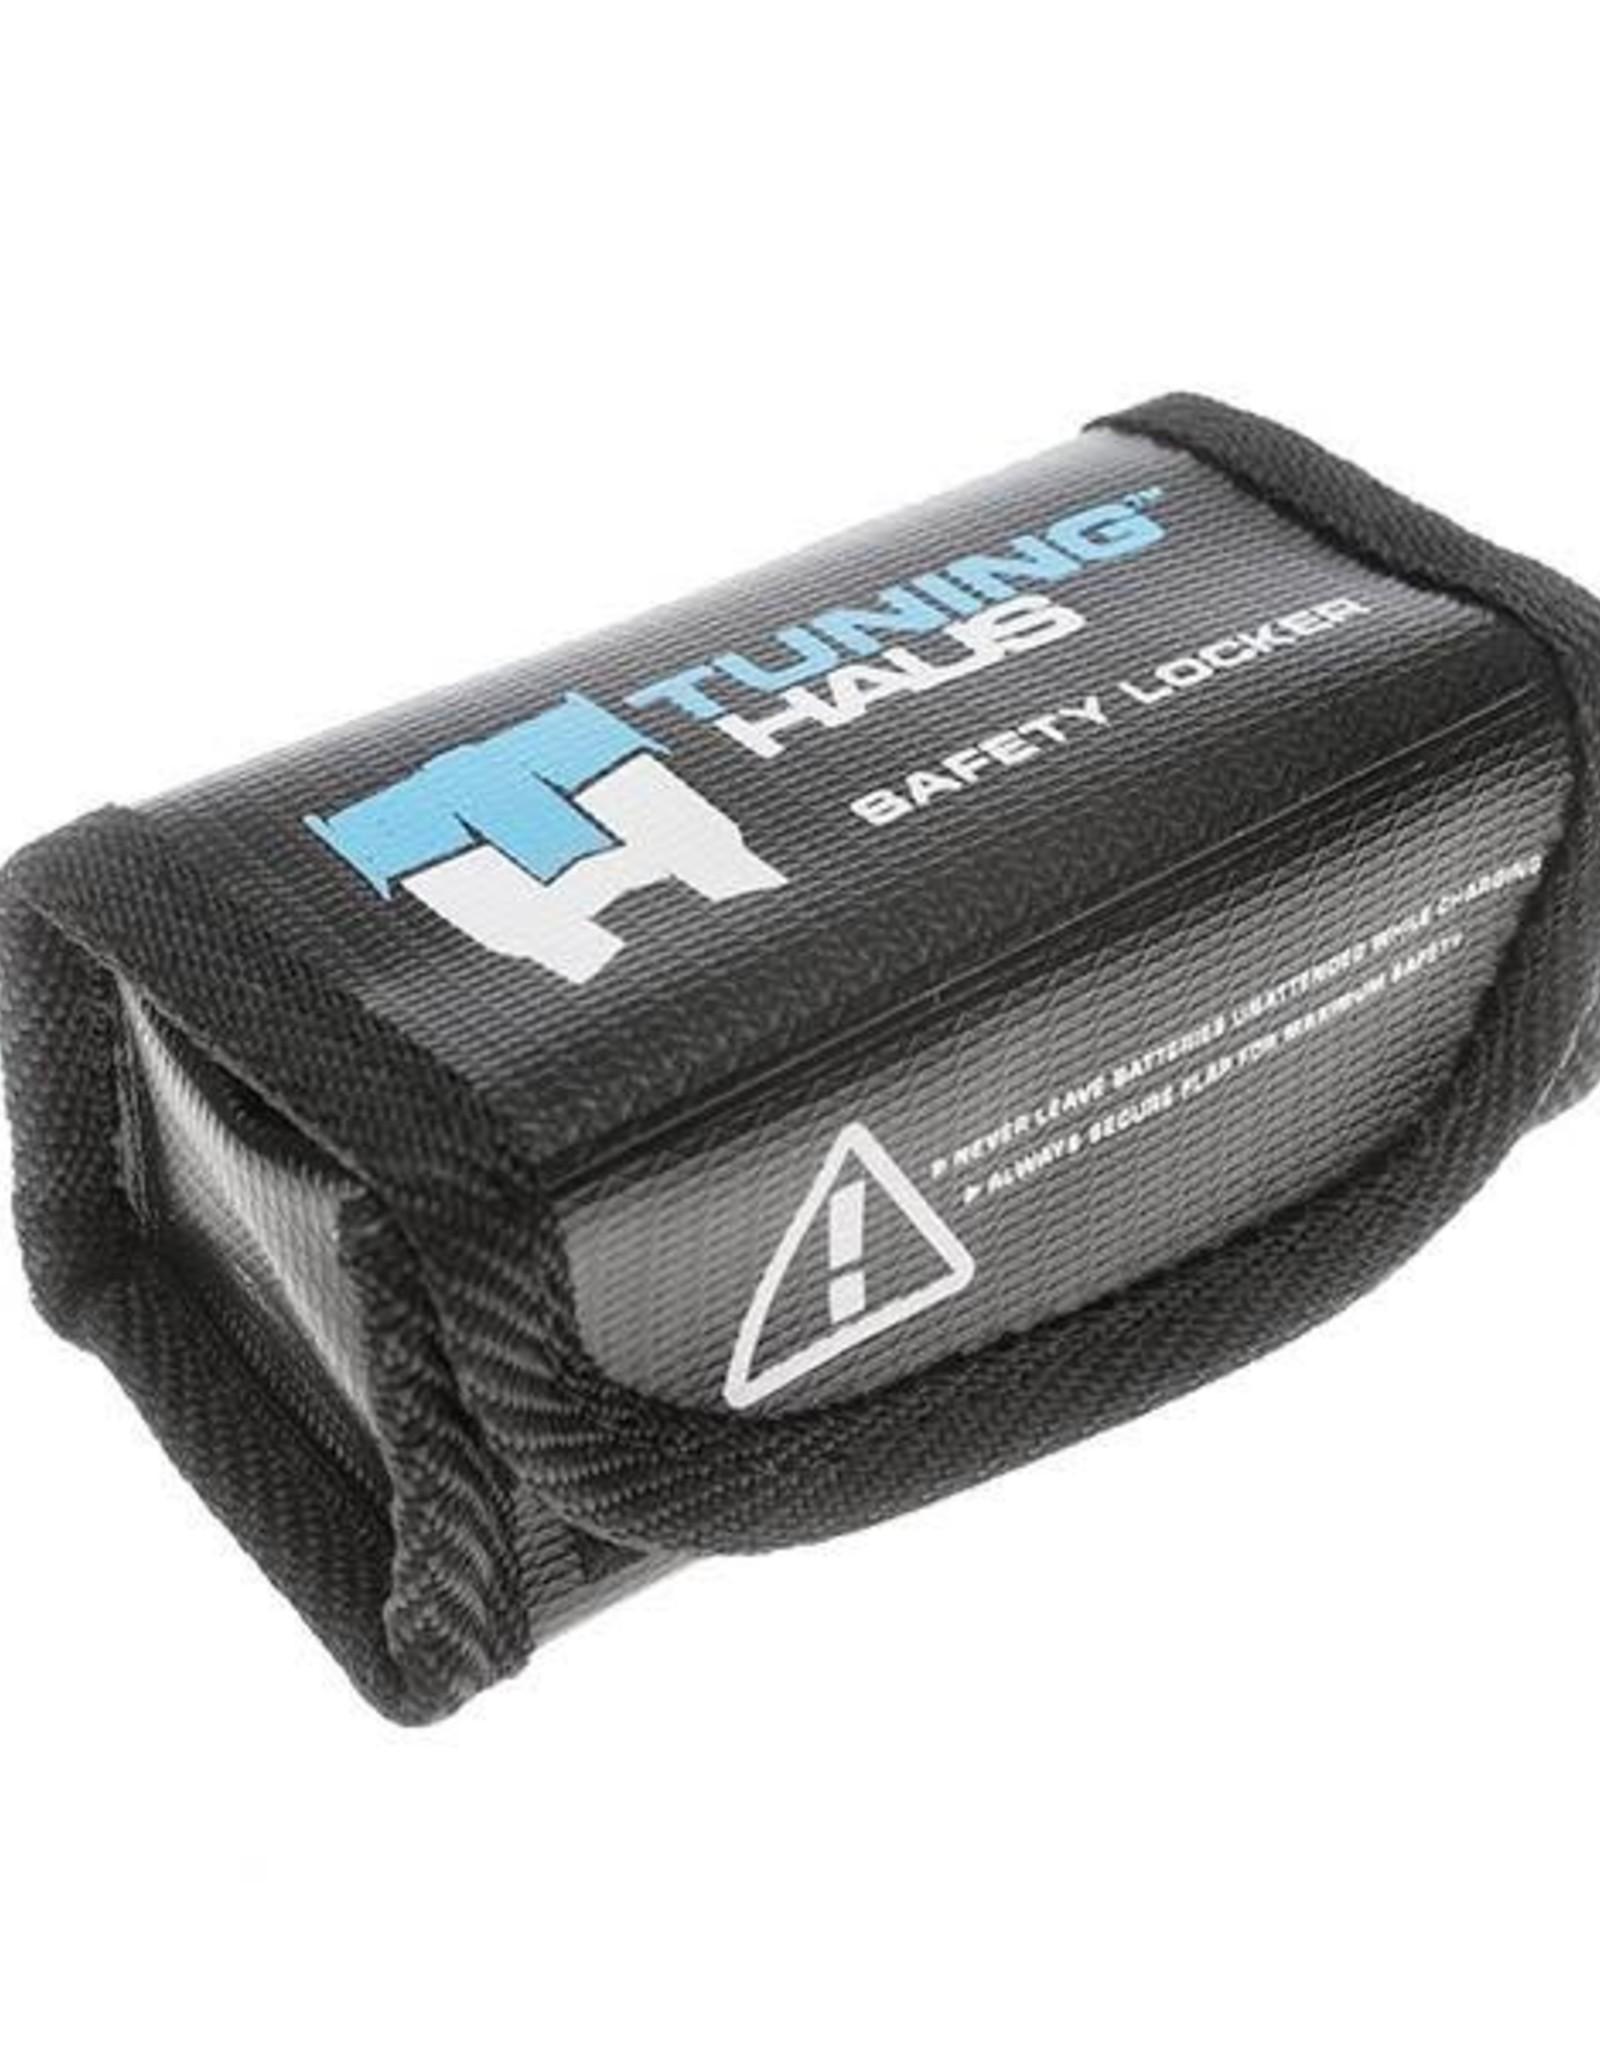 Tuning Haus Tuning Haus - 2s Lipo Safety St